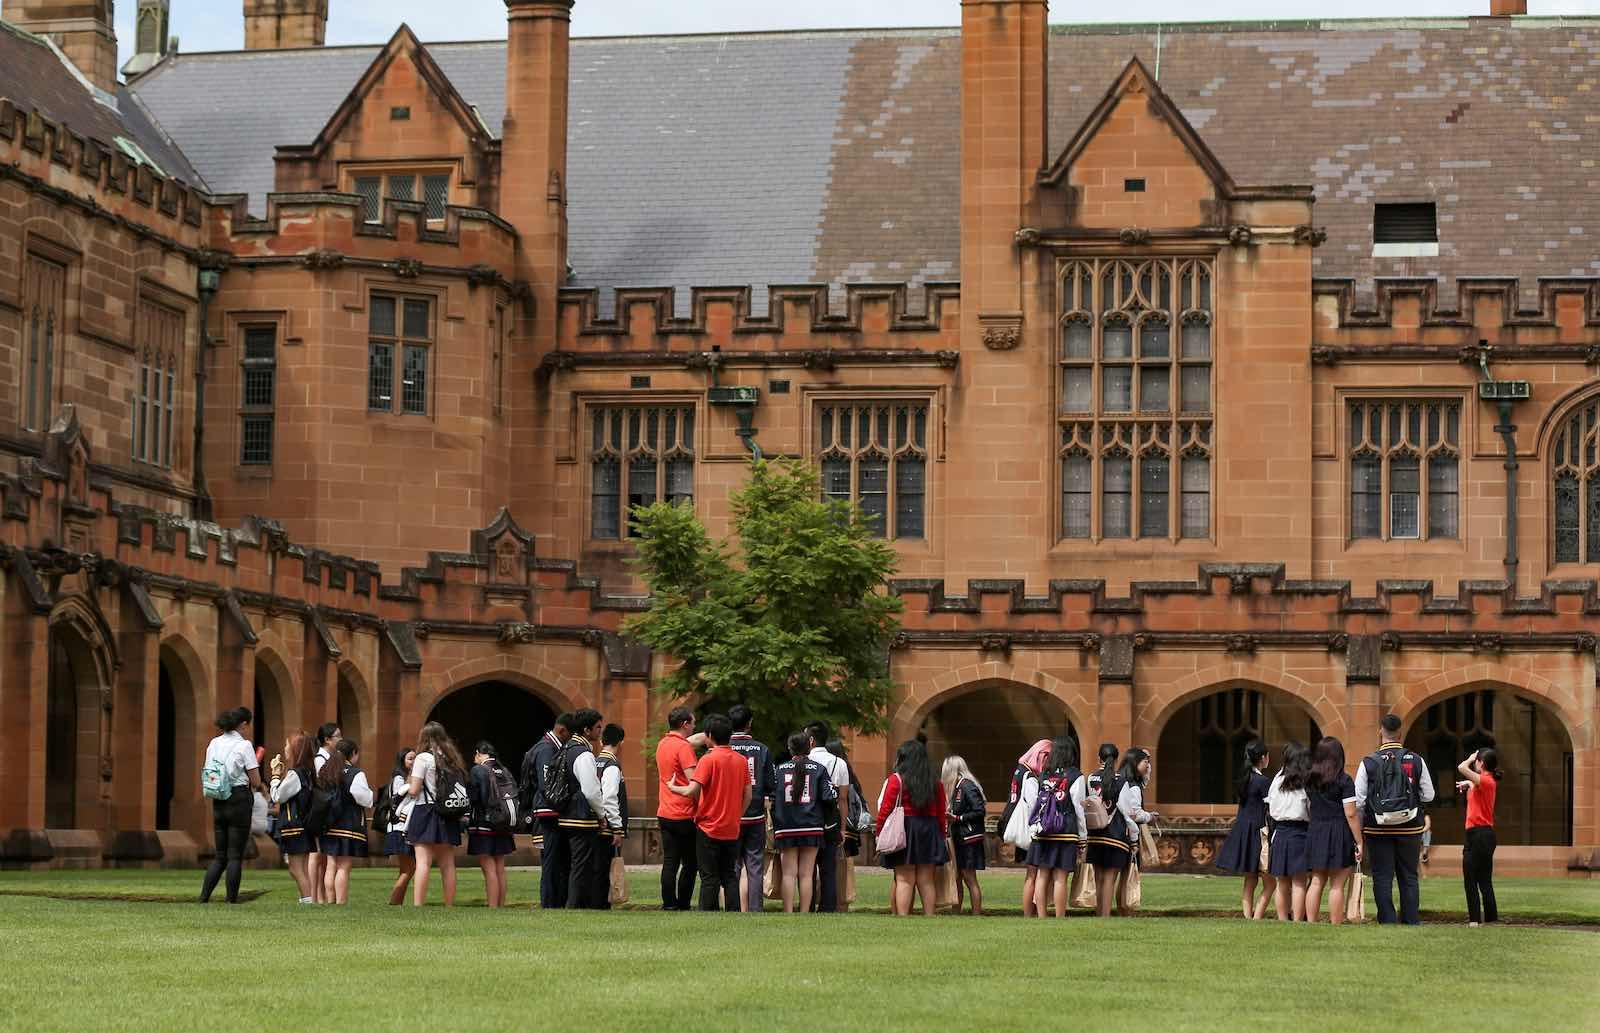 University of Sydney (Xinhua News Agency via Getty Images)